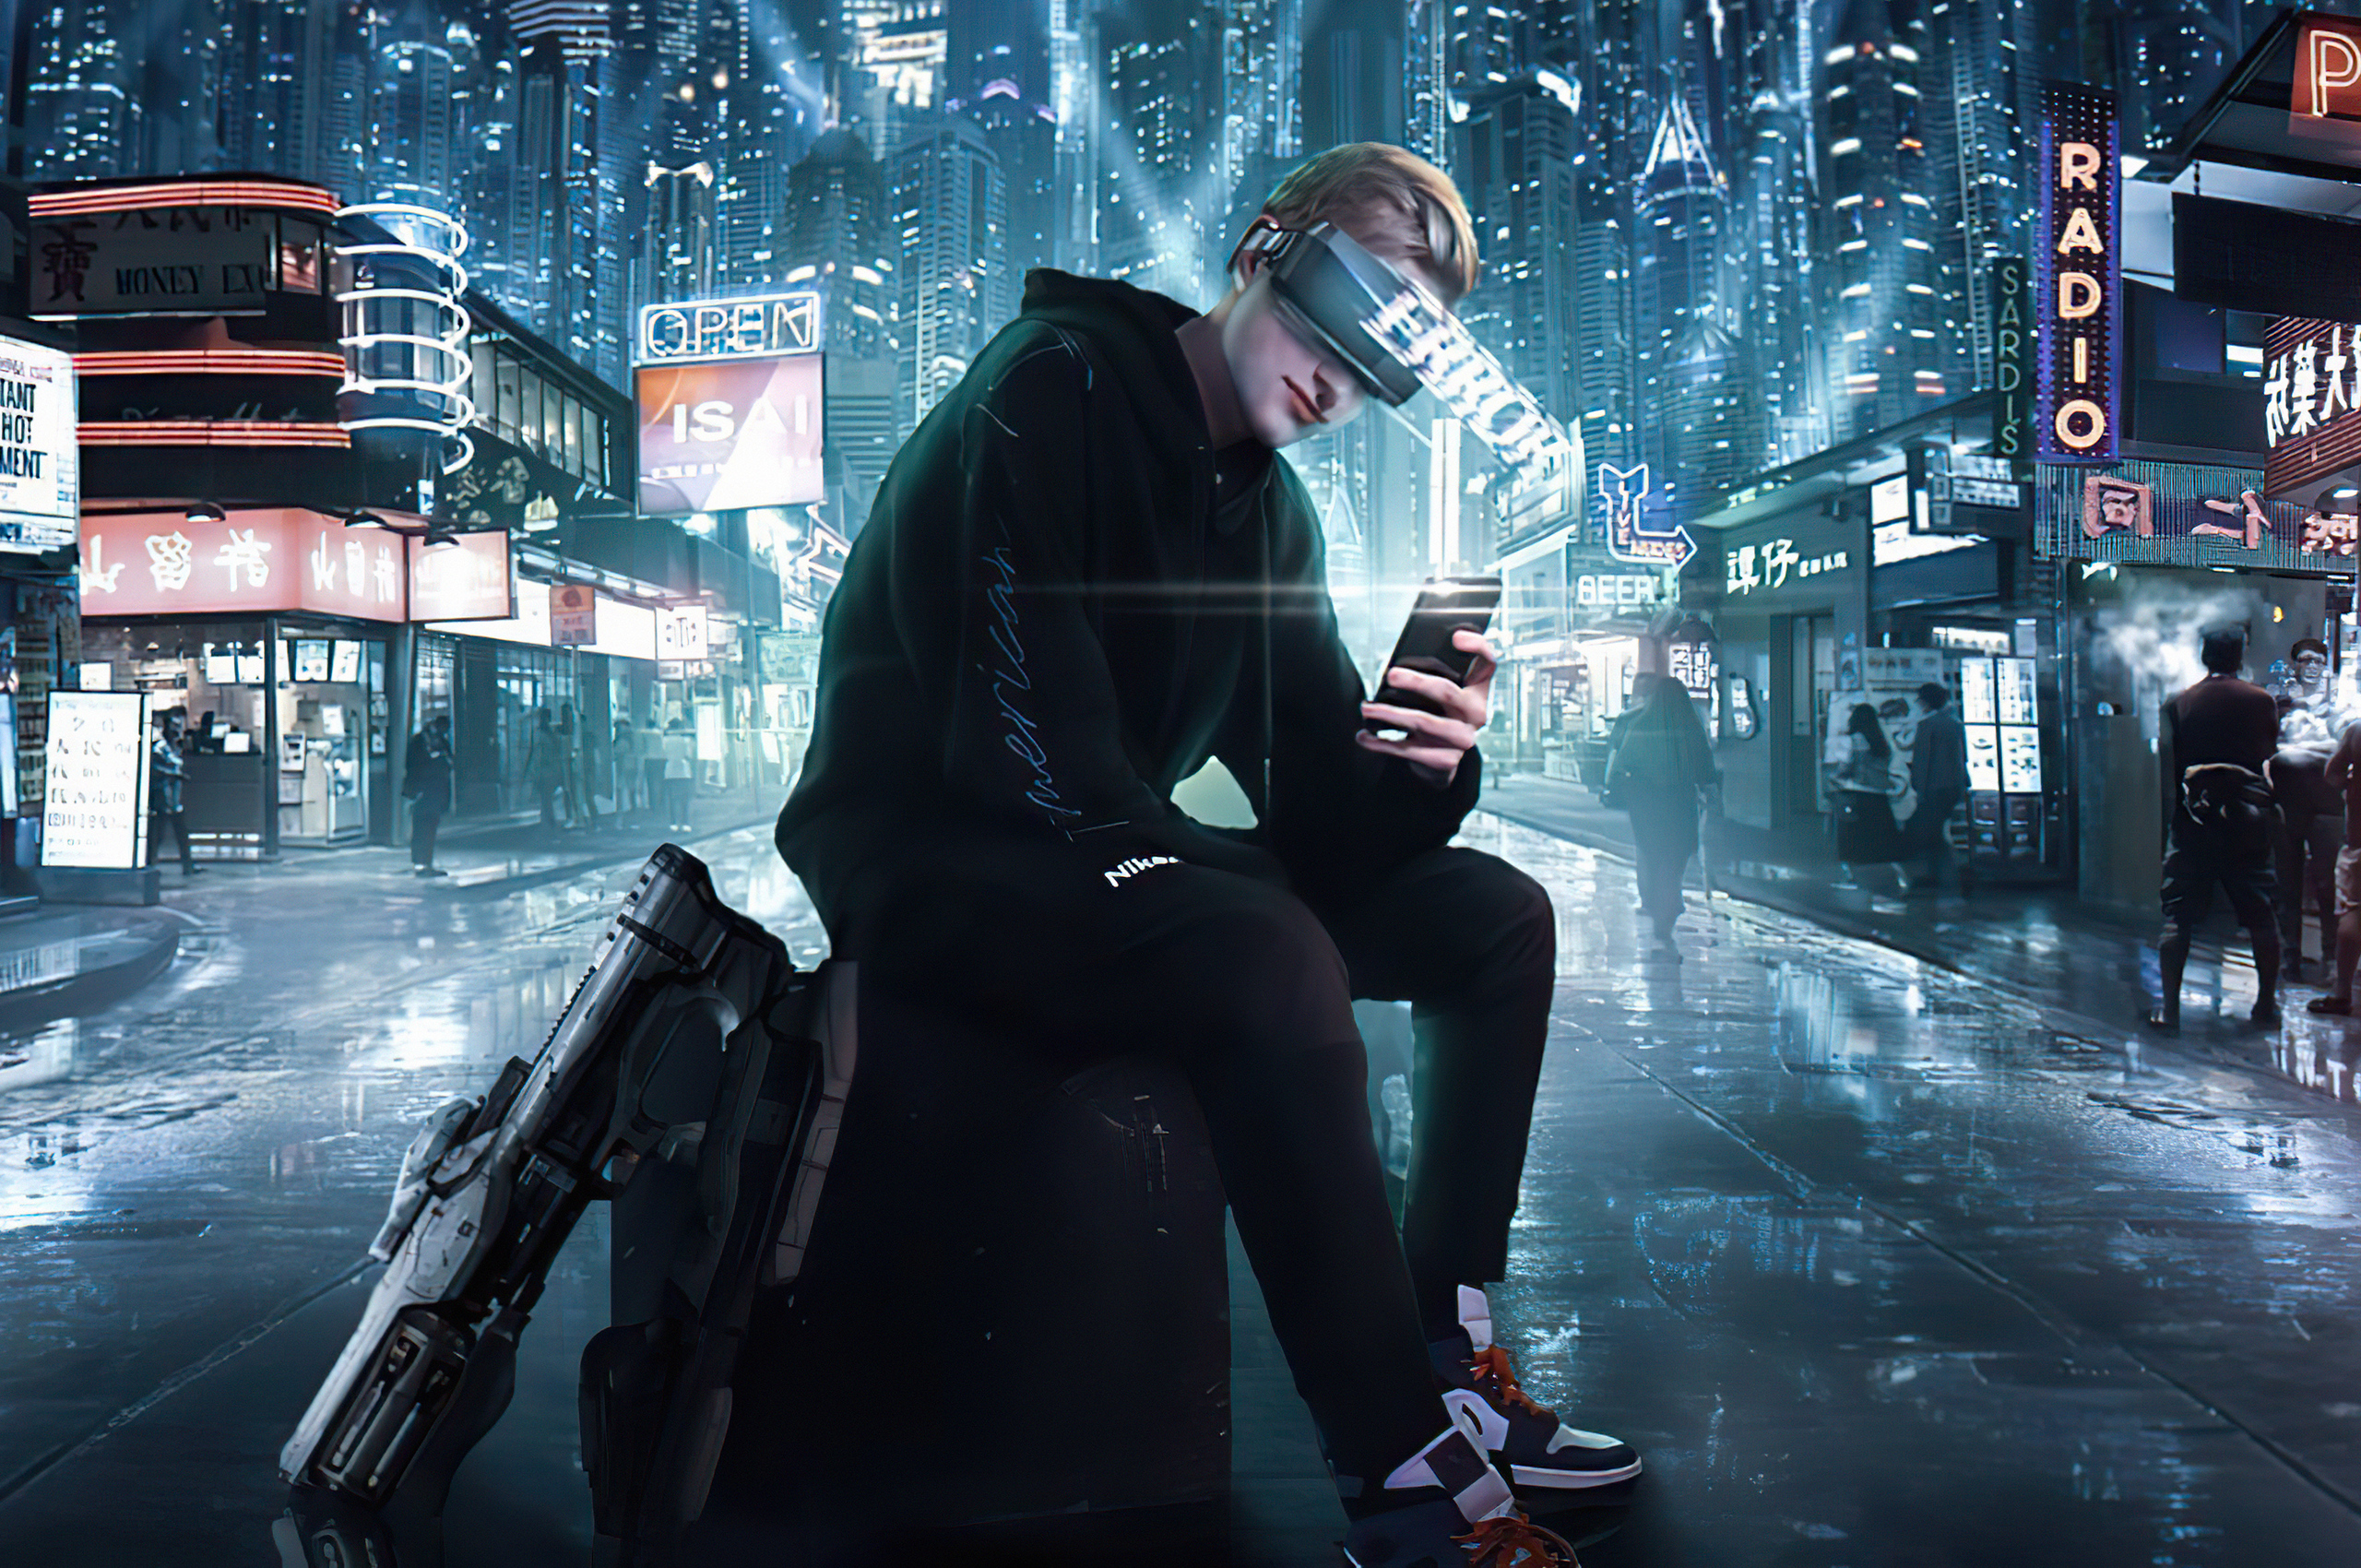 error-in-city-cyberpunk-boy-4k-ej.jpg